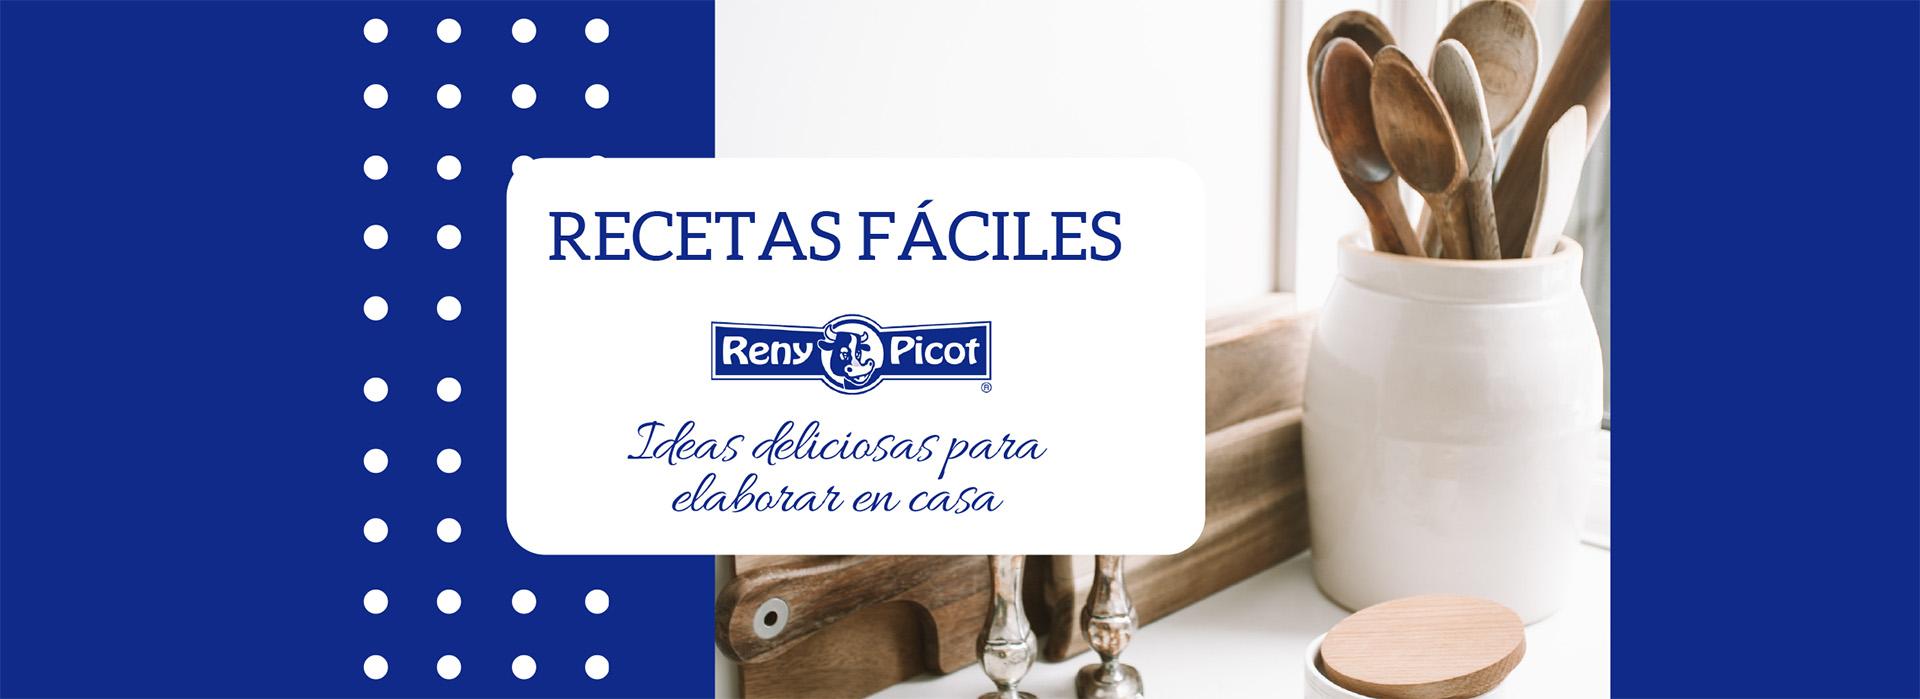 Slider-Recetas-Fáciles